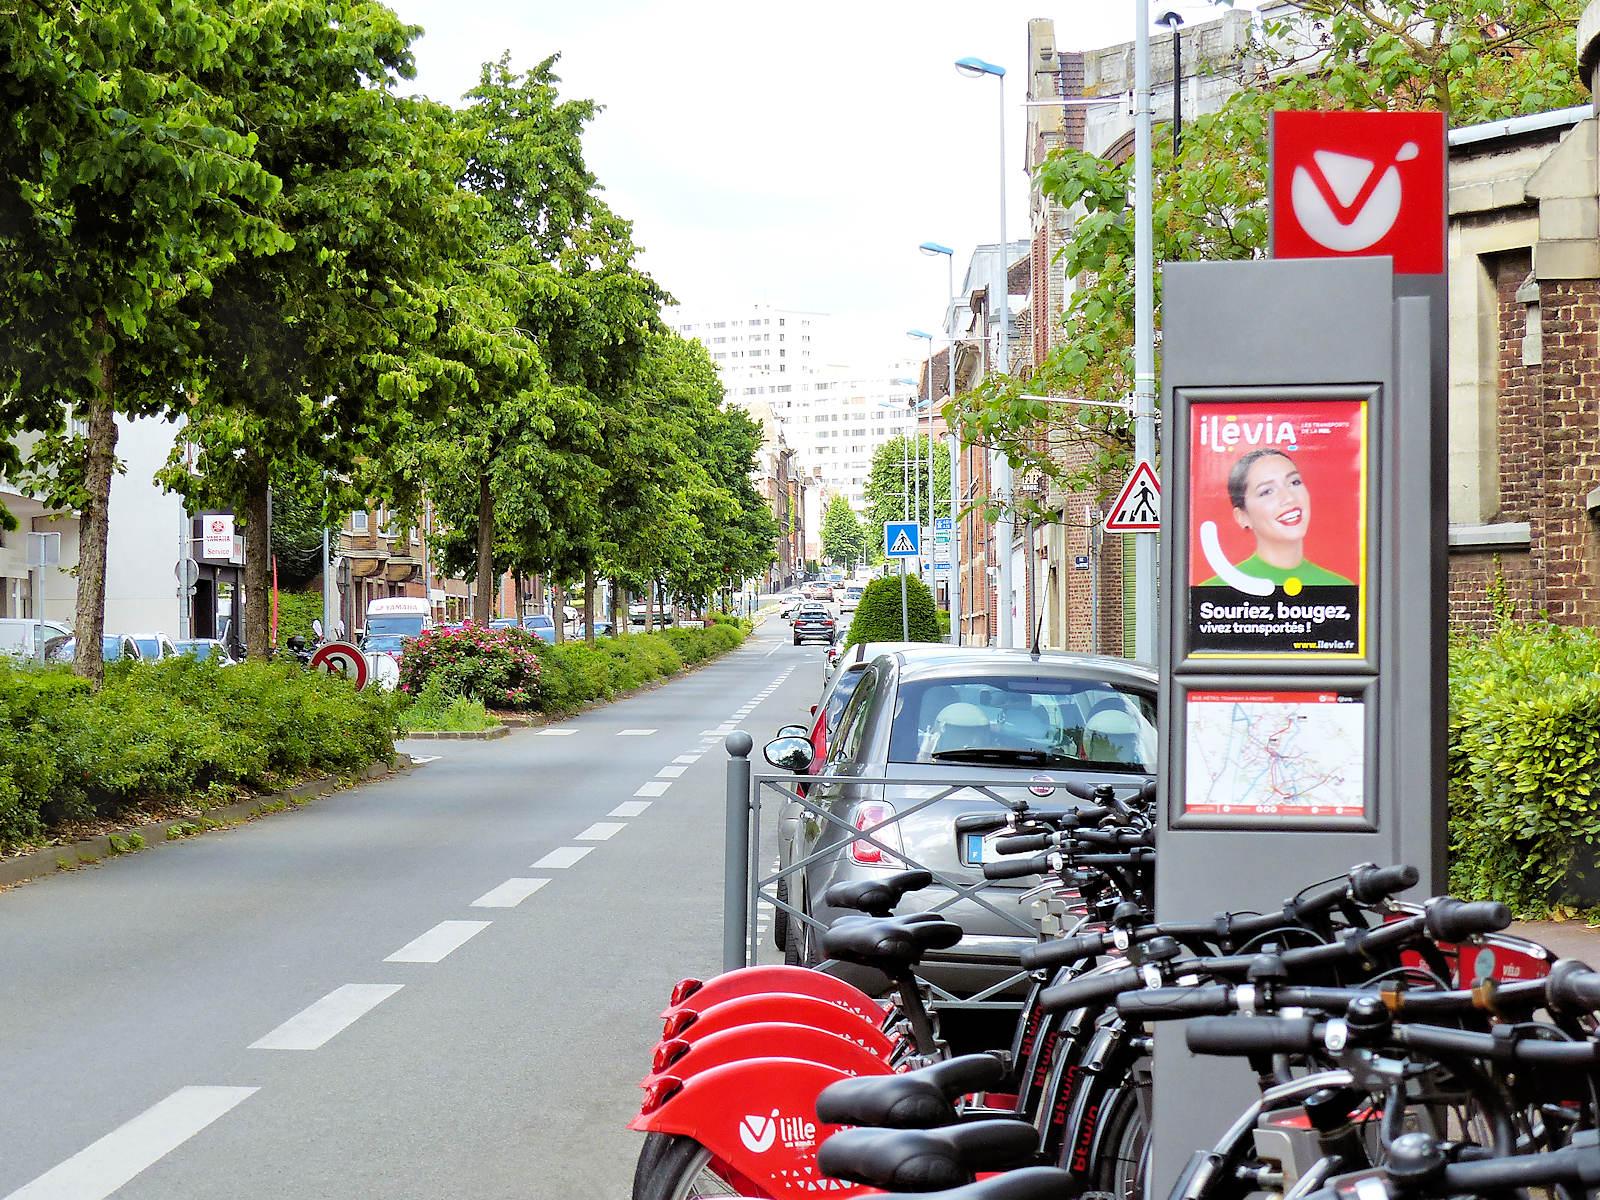 V'Lille Tourcoing - Station Charles Wattinne, Tourcoing